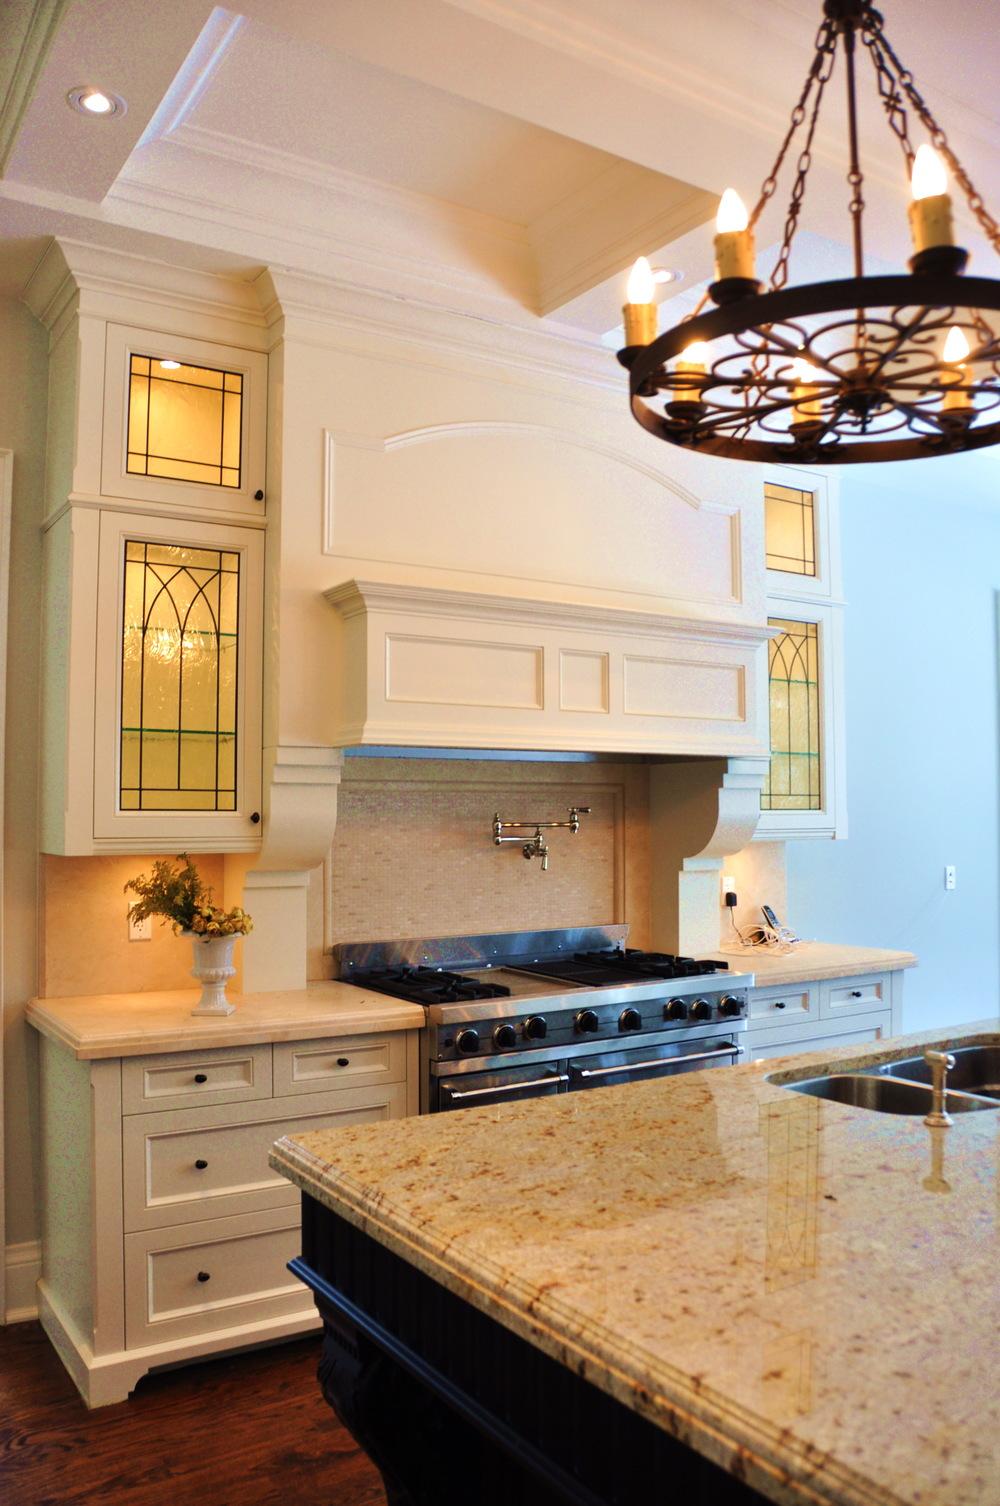 kitchen stove wall.jpg